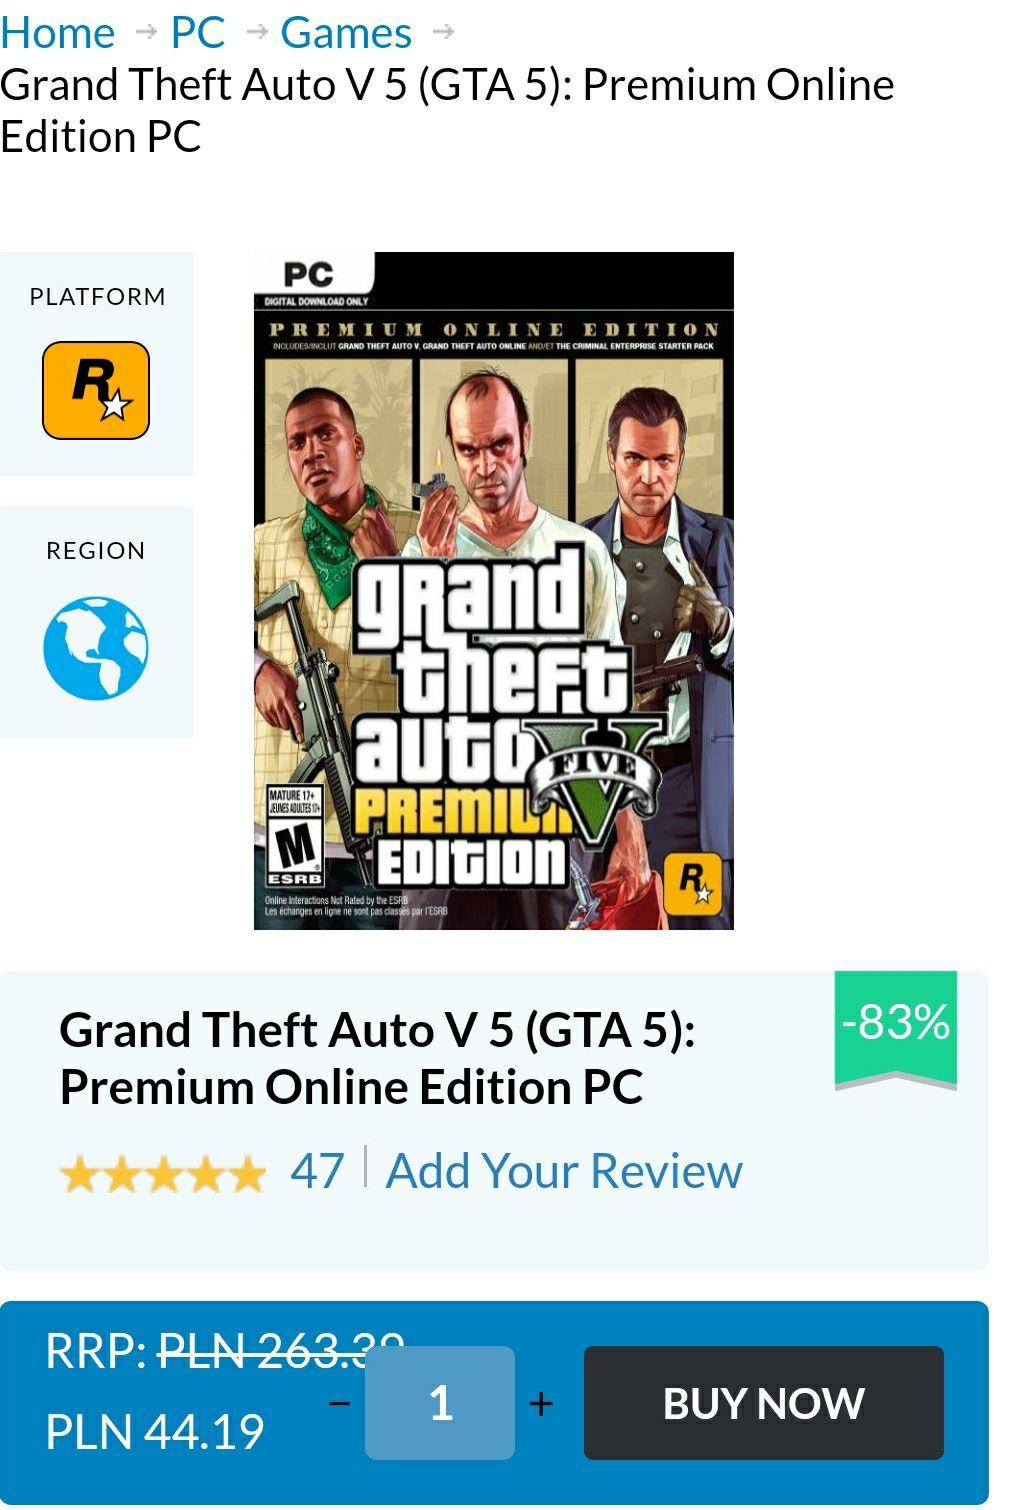 Grand Theft Auto V 5 (GTA 5): Premium Online Edition PC (7,99£)